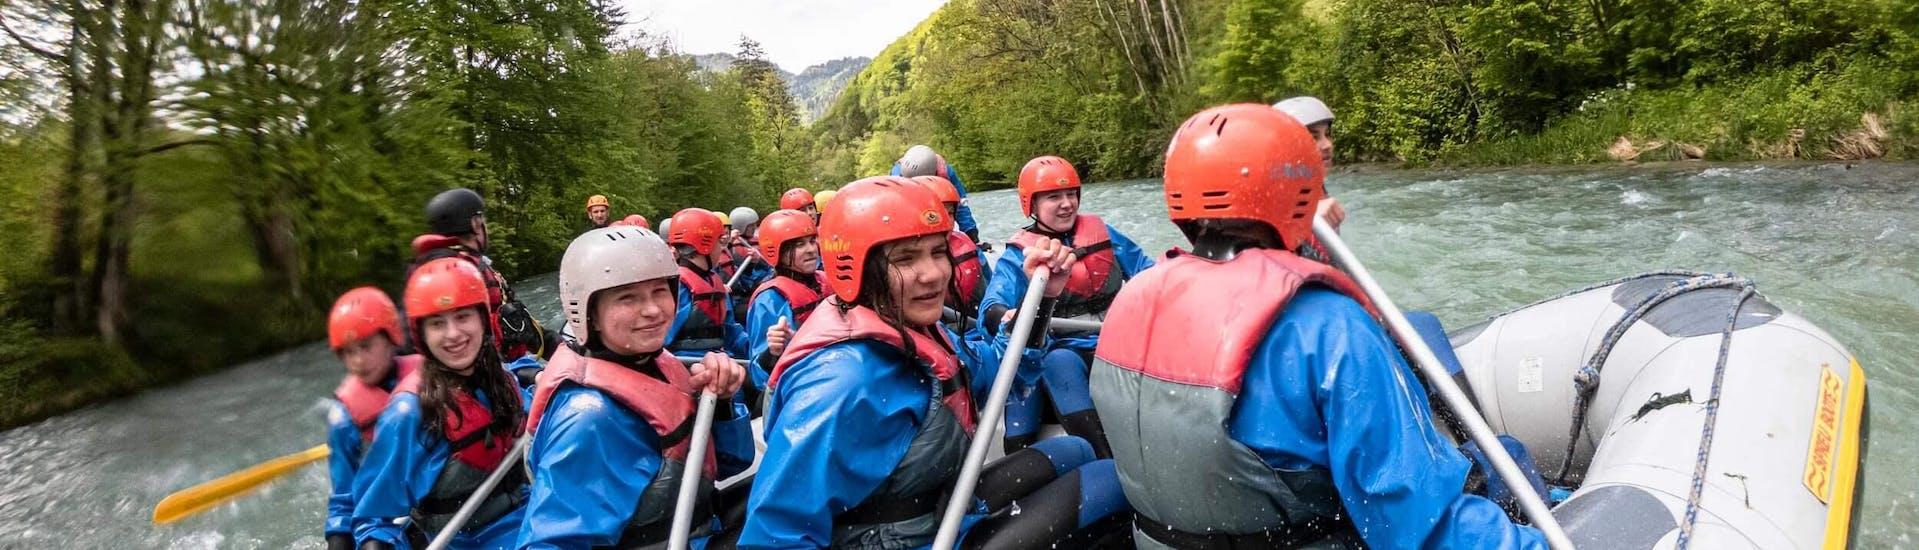 rafting-goll-tour---brave-beginners---berchtesgadener-ache-r-e-t-berchtesgaden-hero